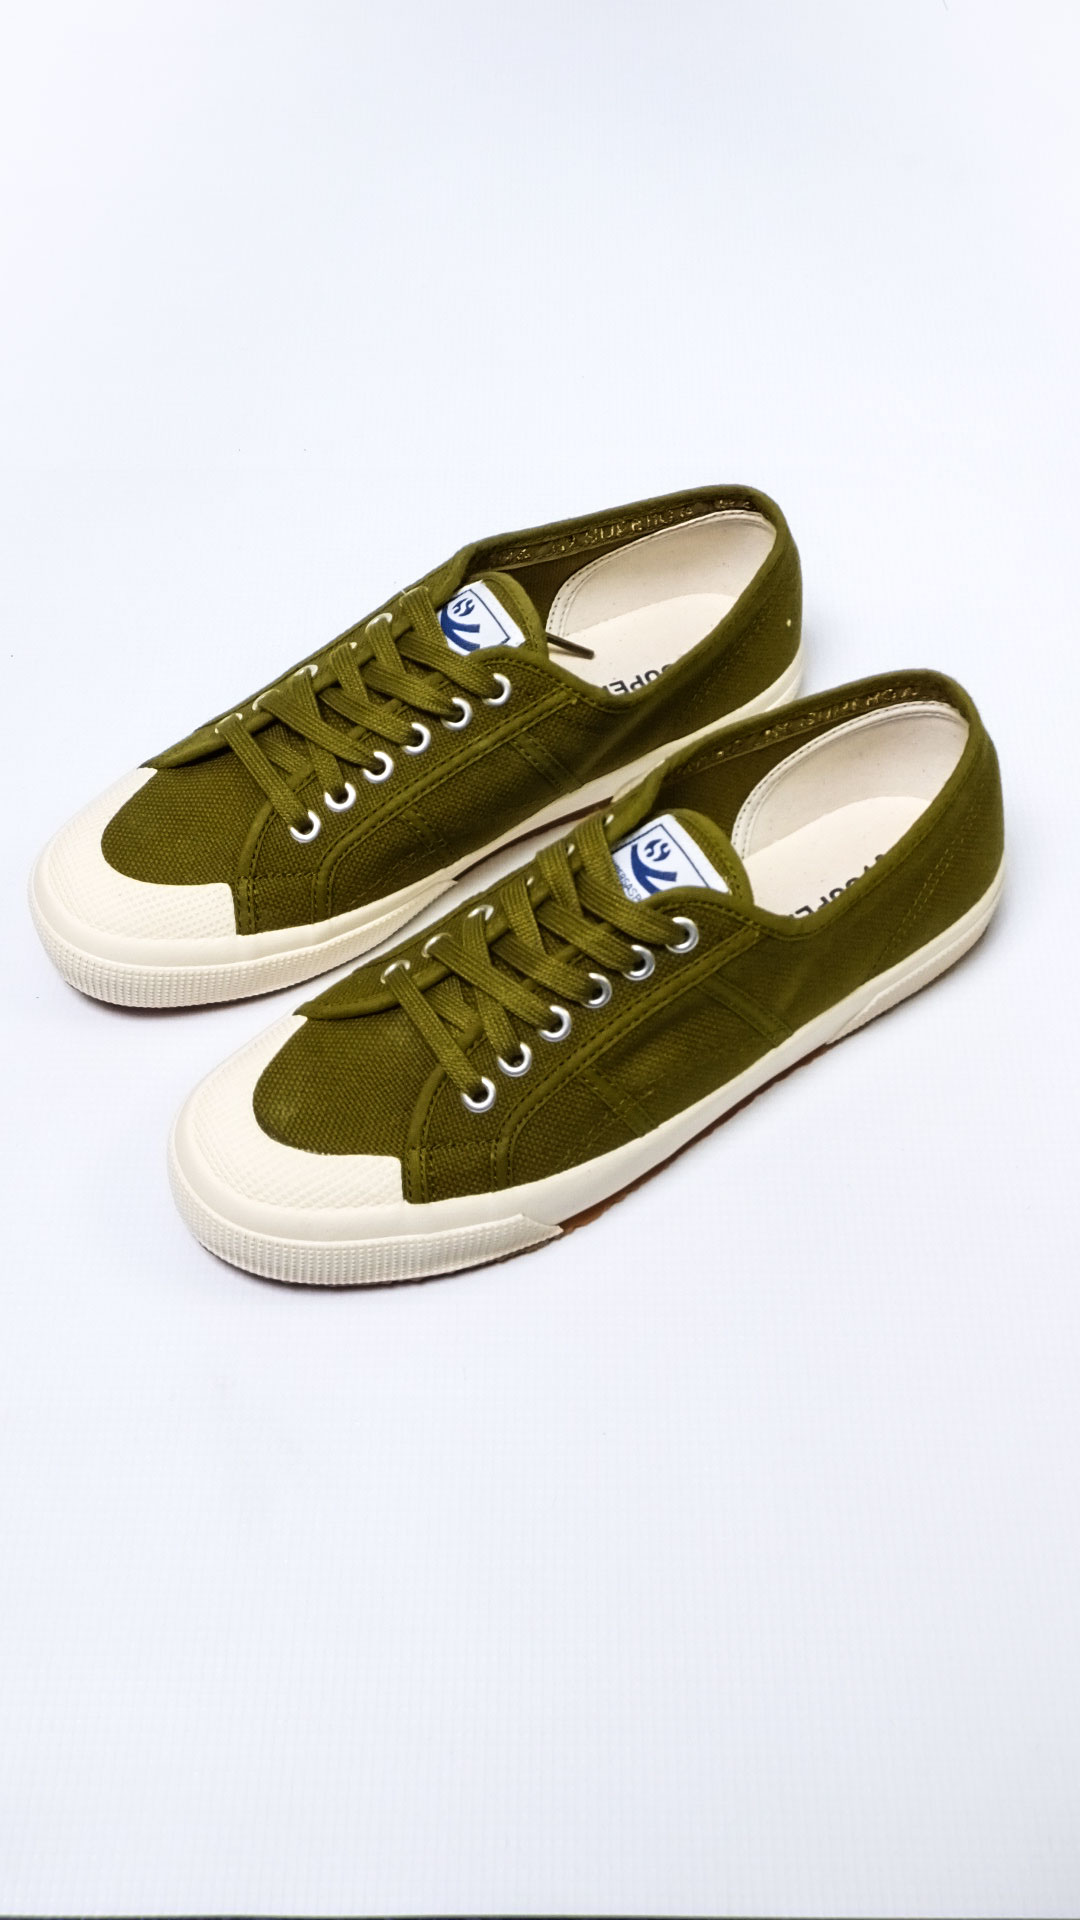 44a5604b61 Superga 2390 Cotu – Green Military. 🔍. £52.00